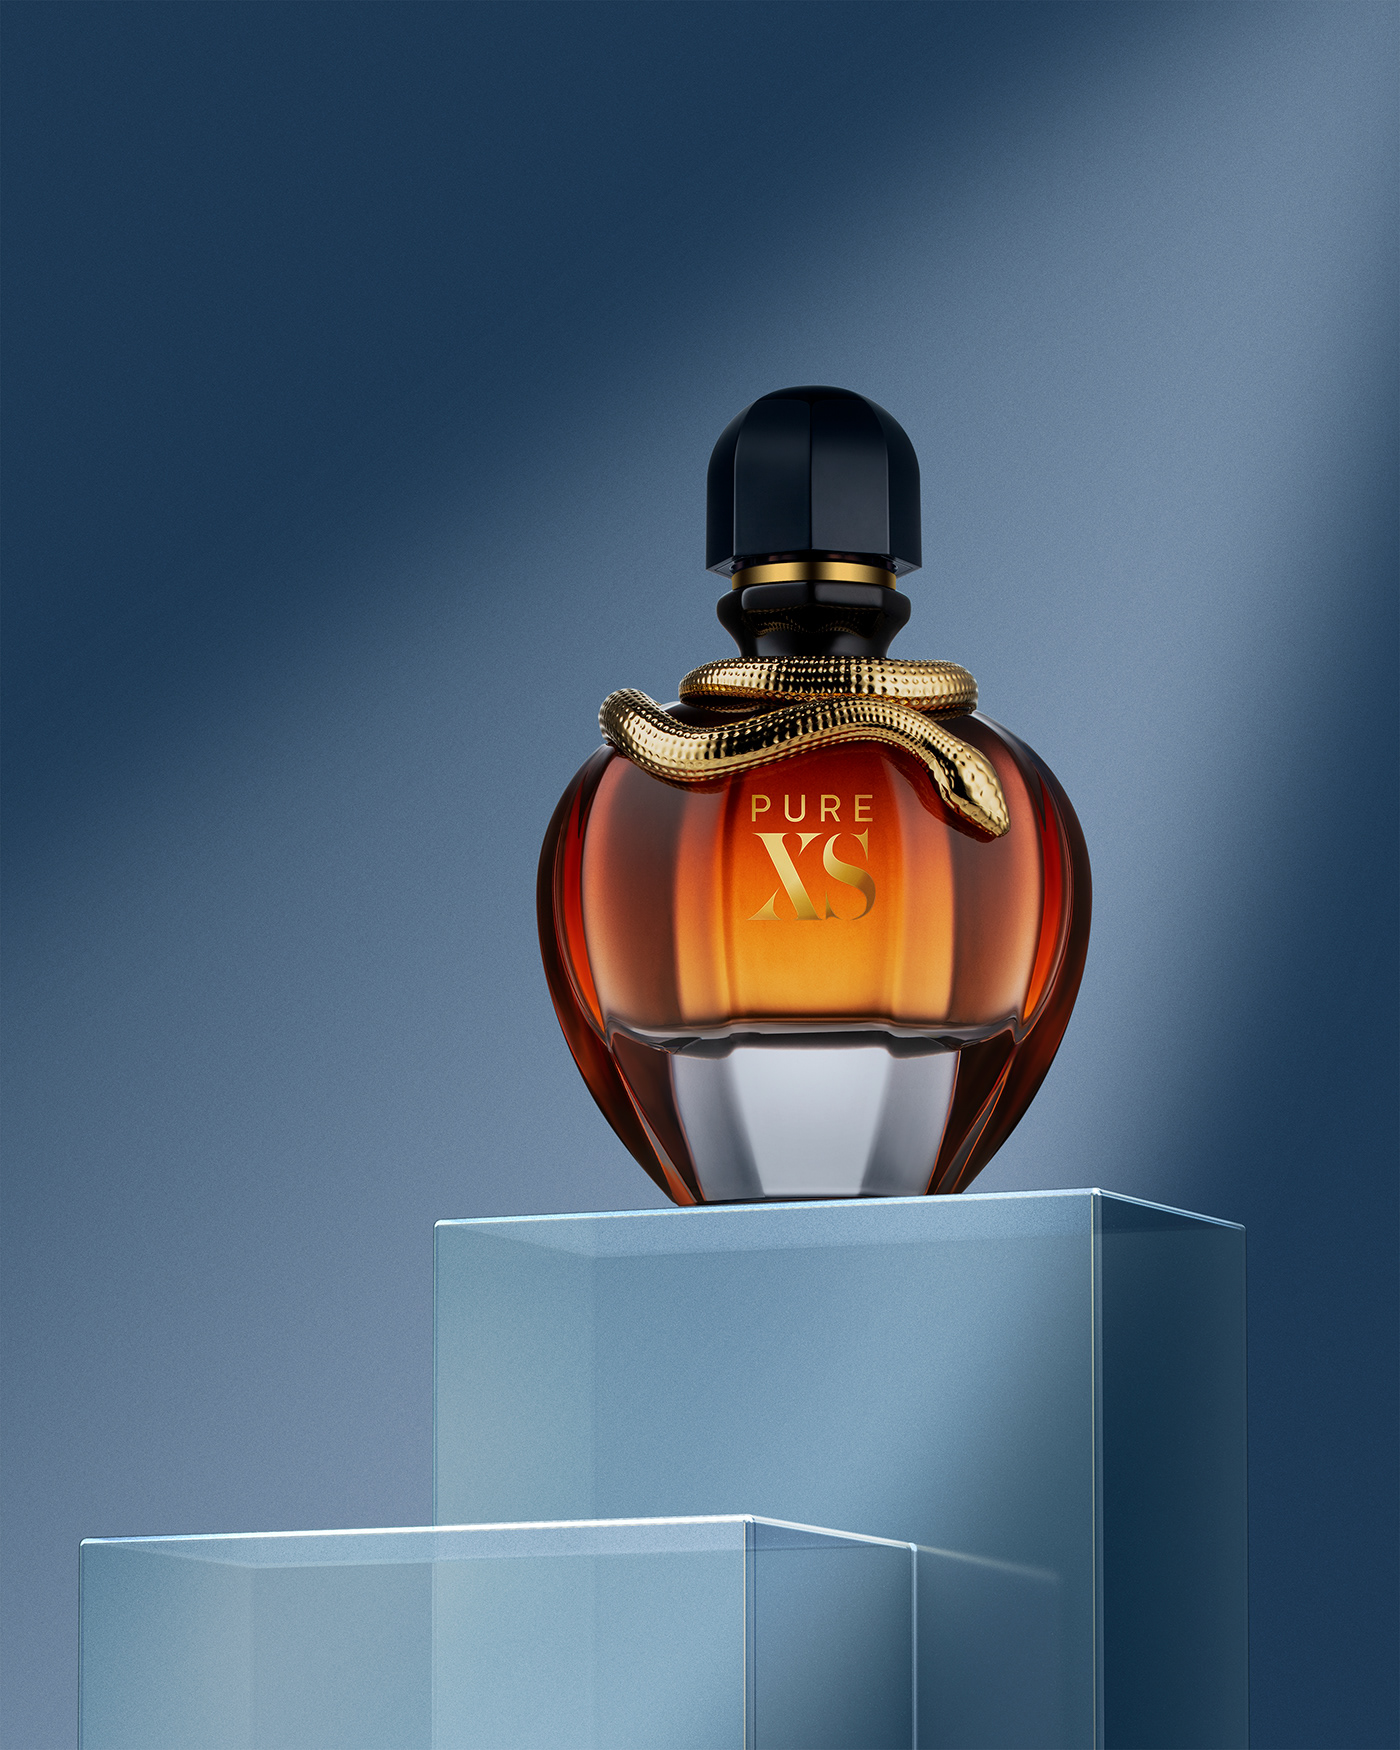 Image may contain: wall, indoor and perfume